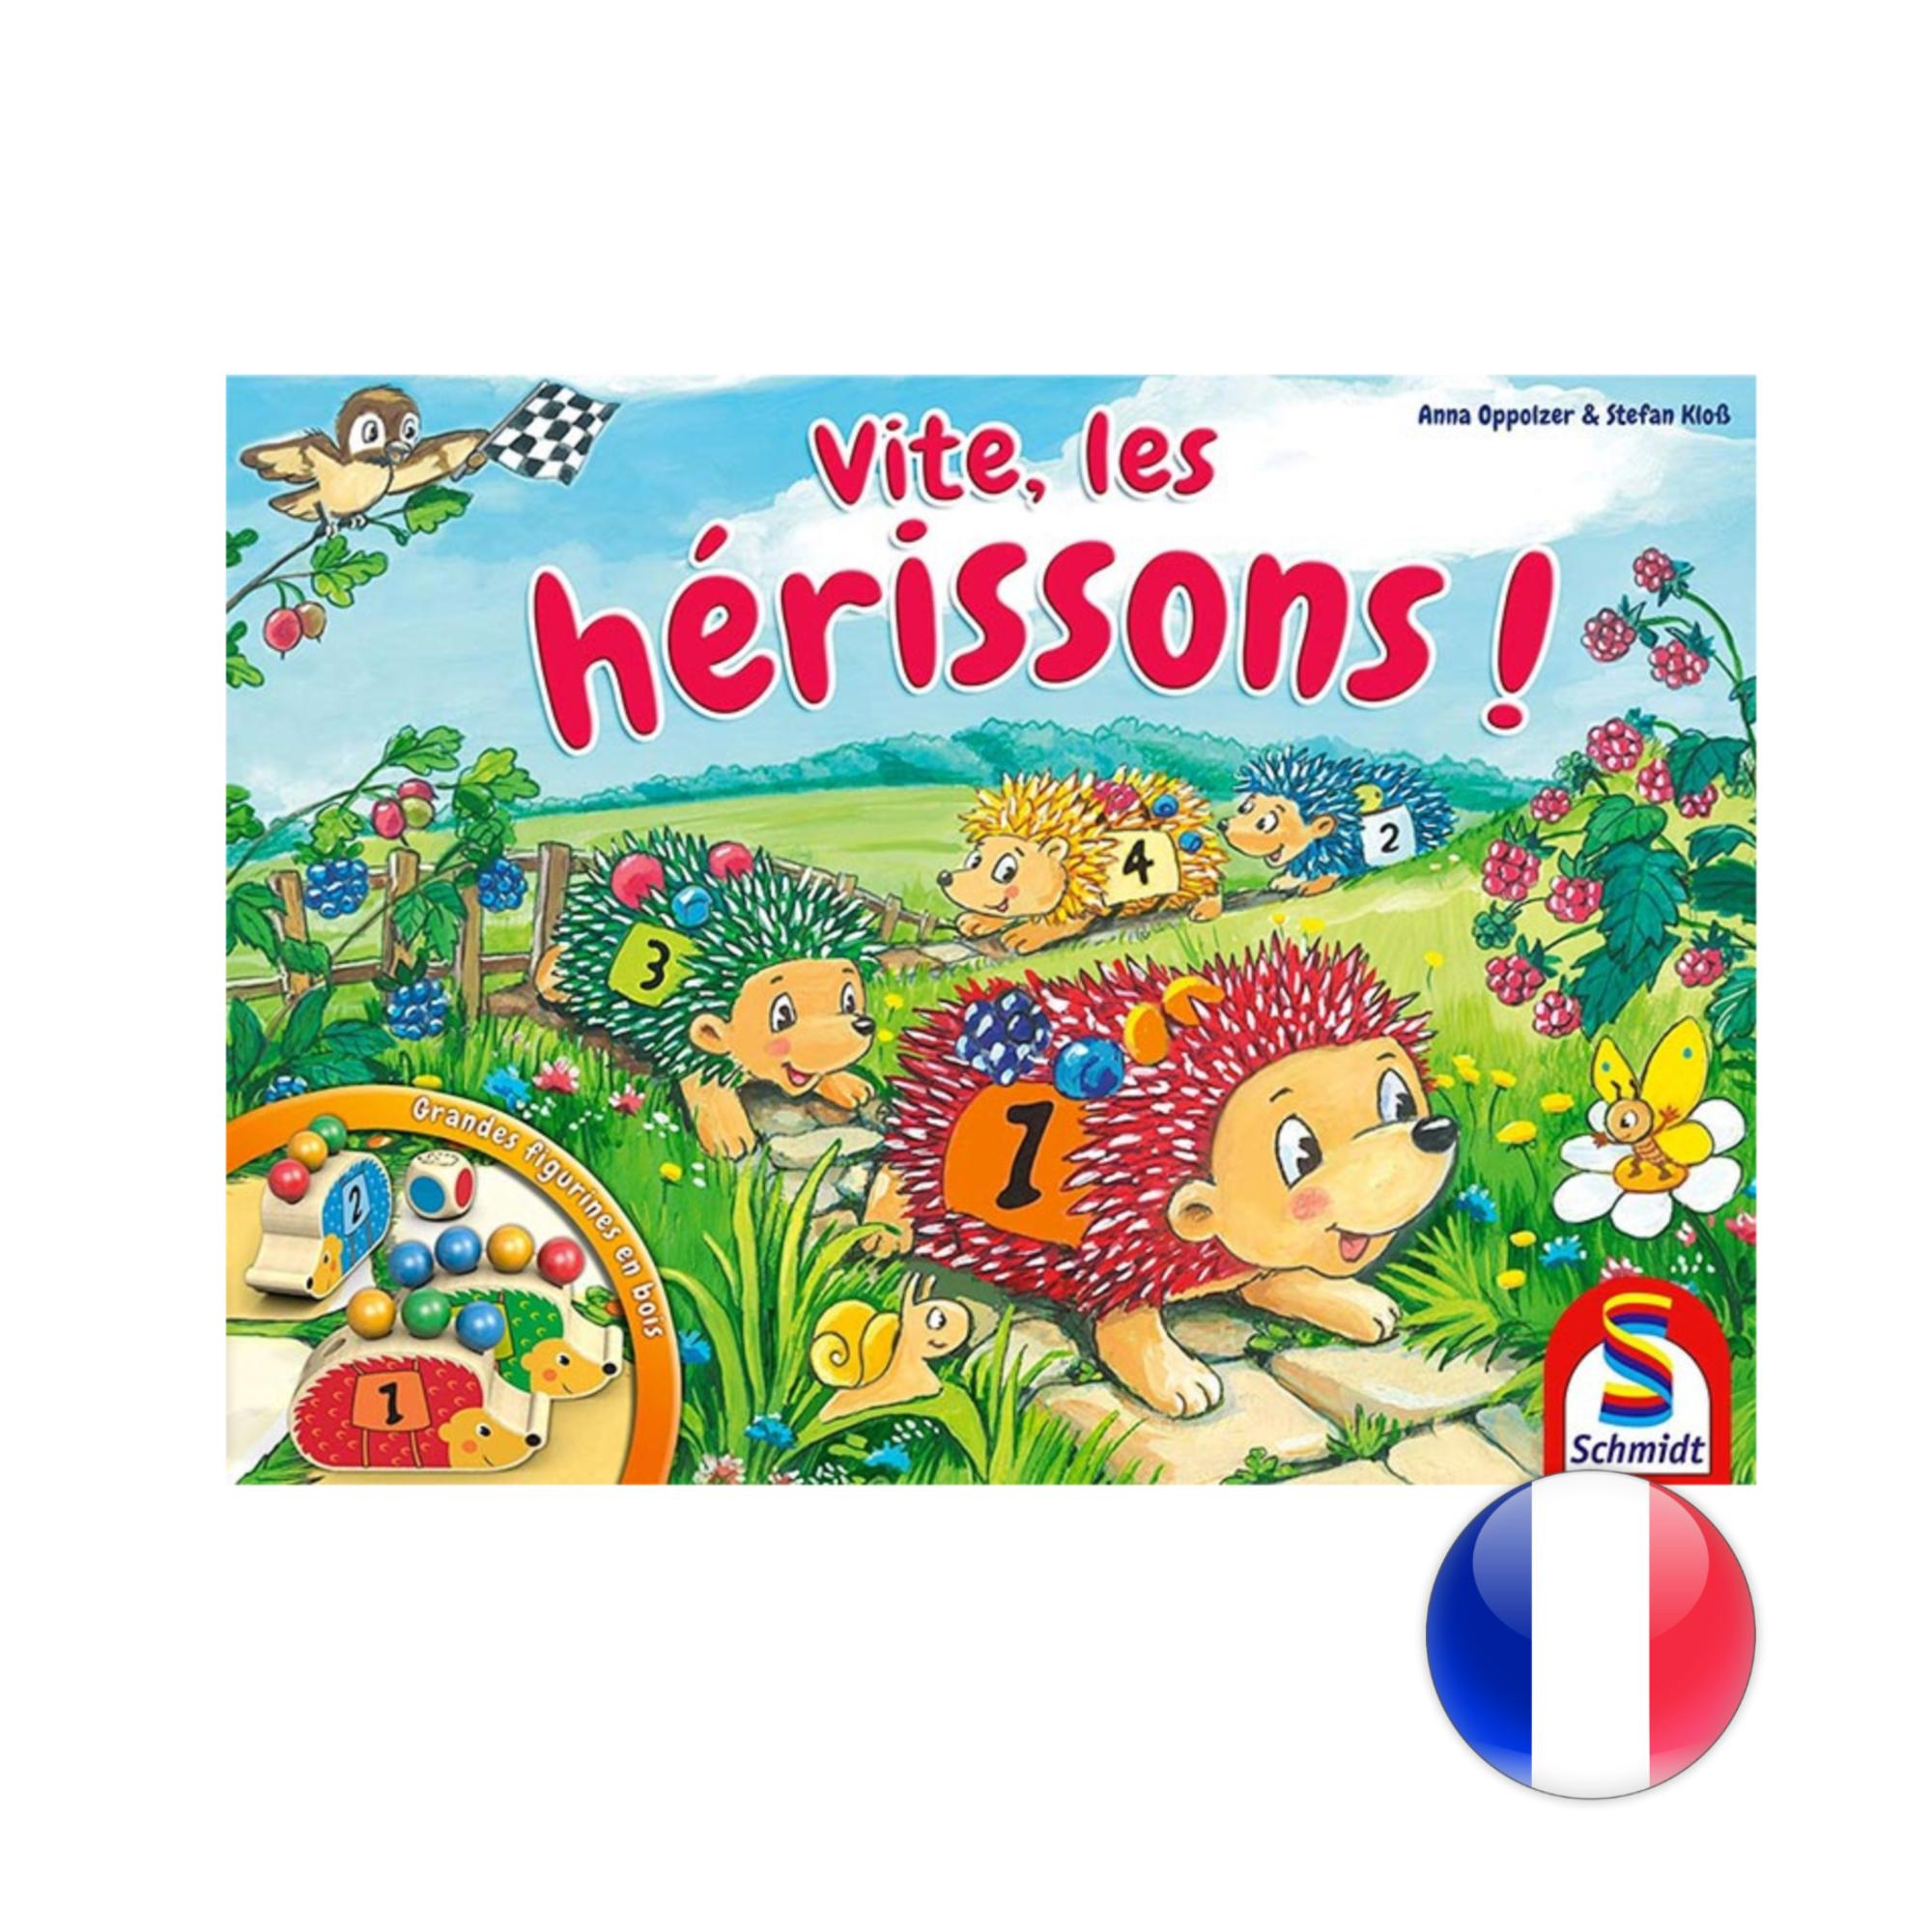 Schmidt Vite, les Herissons!